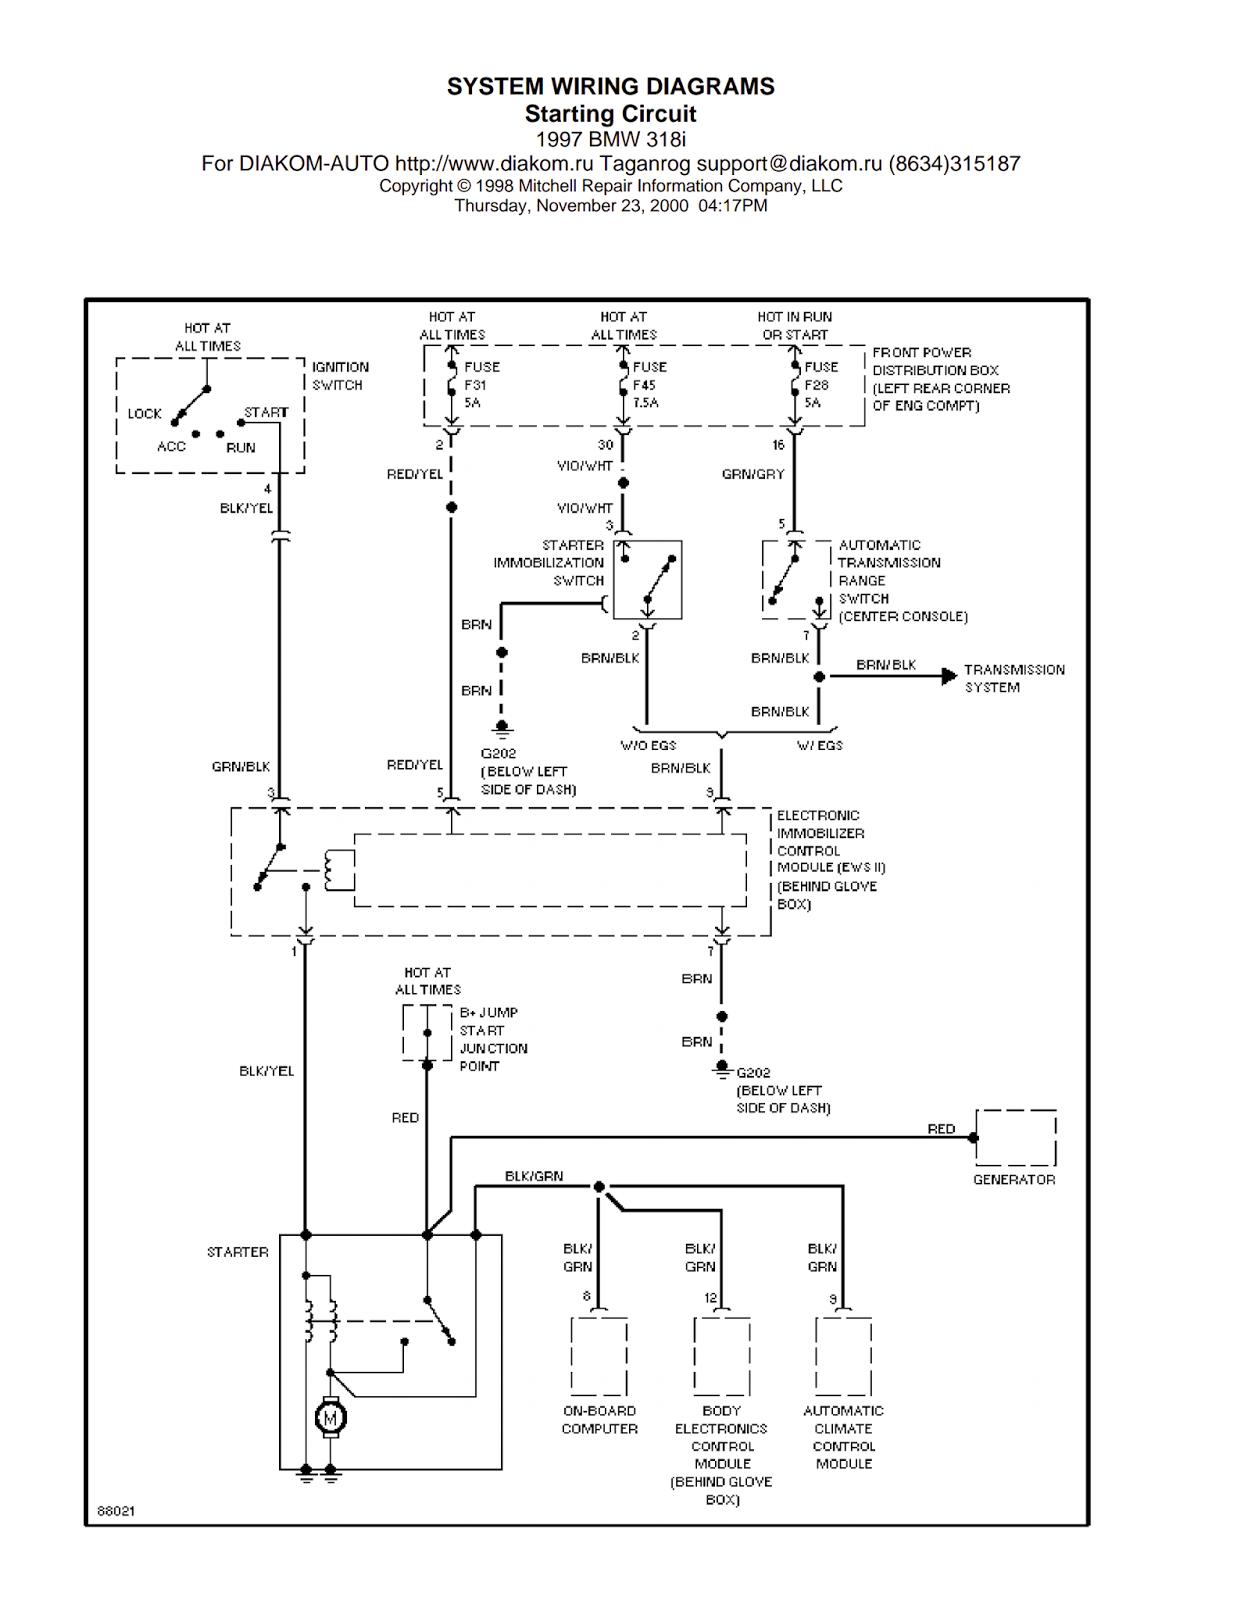 bmw 318i interior fuse panel box